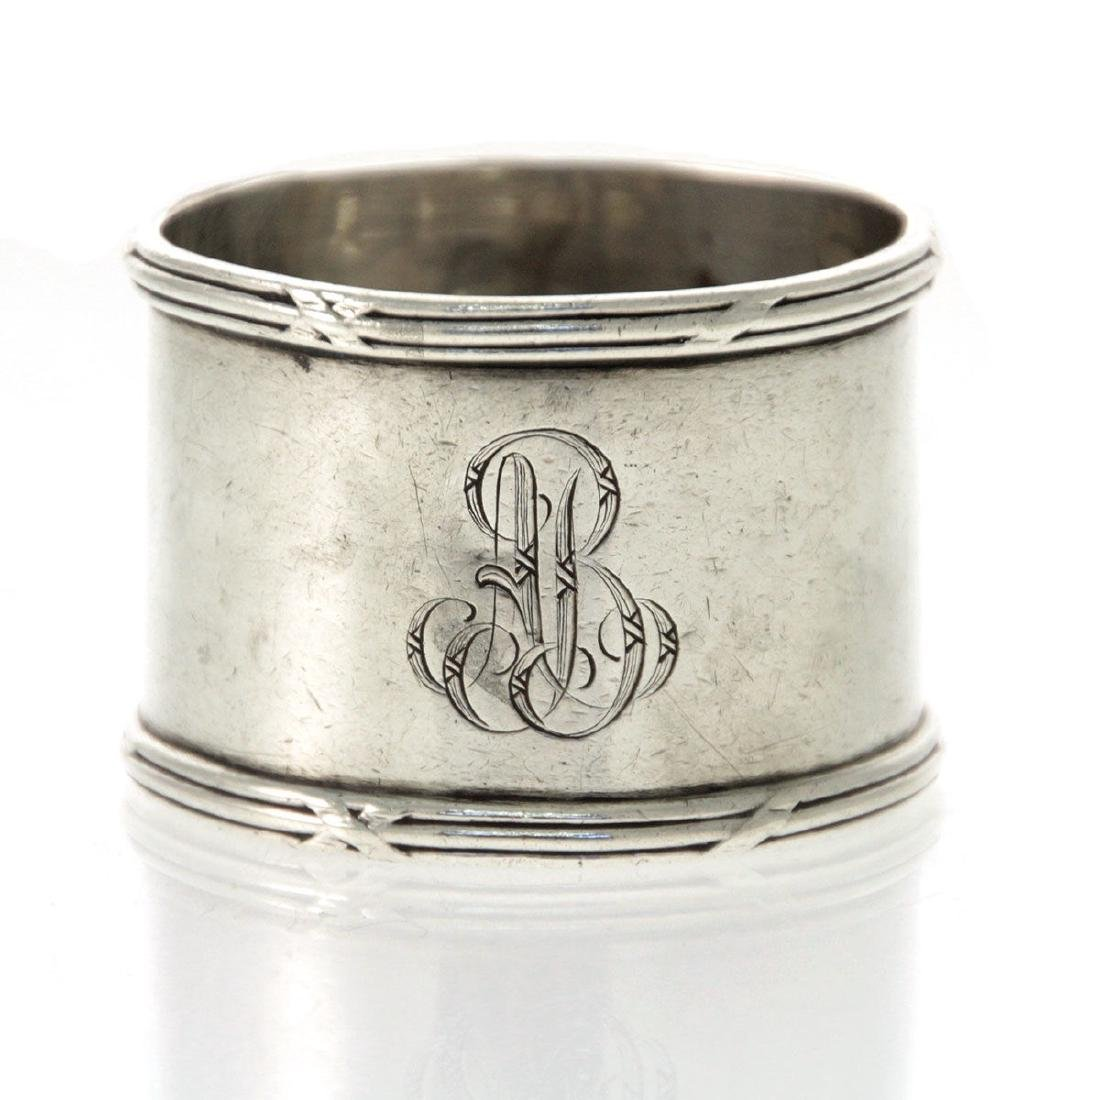 Emile Puiforcat Sterling Silver Napkin Ring, Paris,